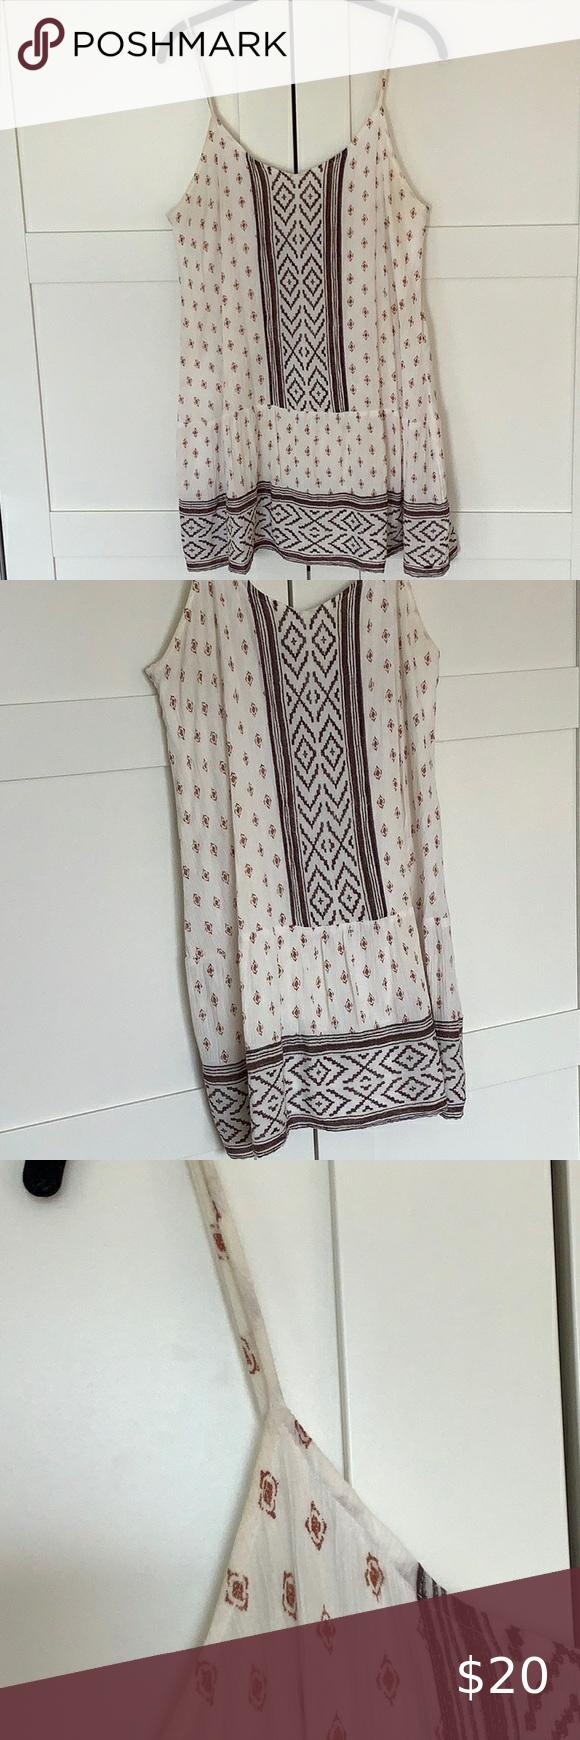 Boho O Neil Summer Dress Sz M Summer Dresses Dresses Clothes Design [ 1740 x 580 Pixel ]